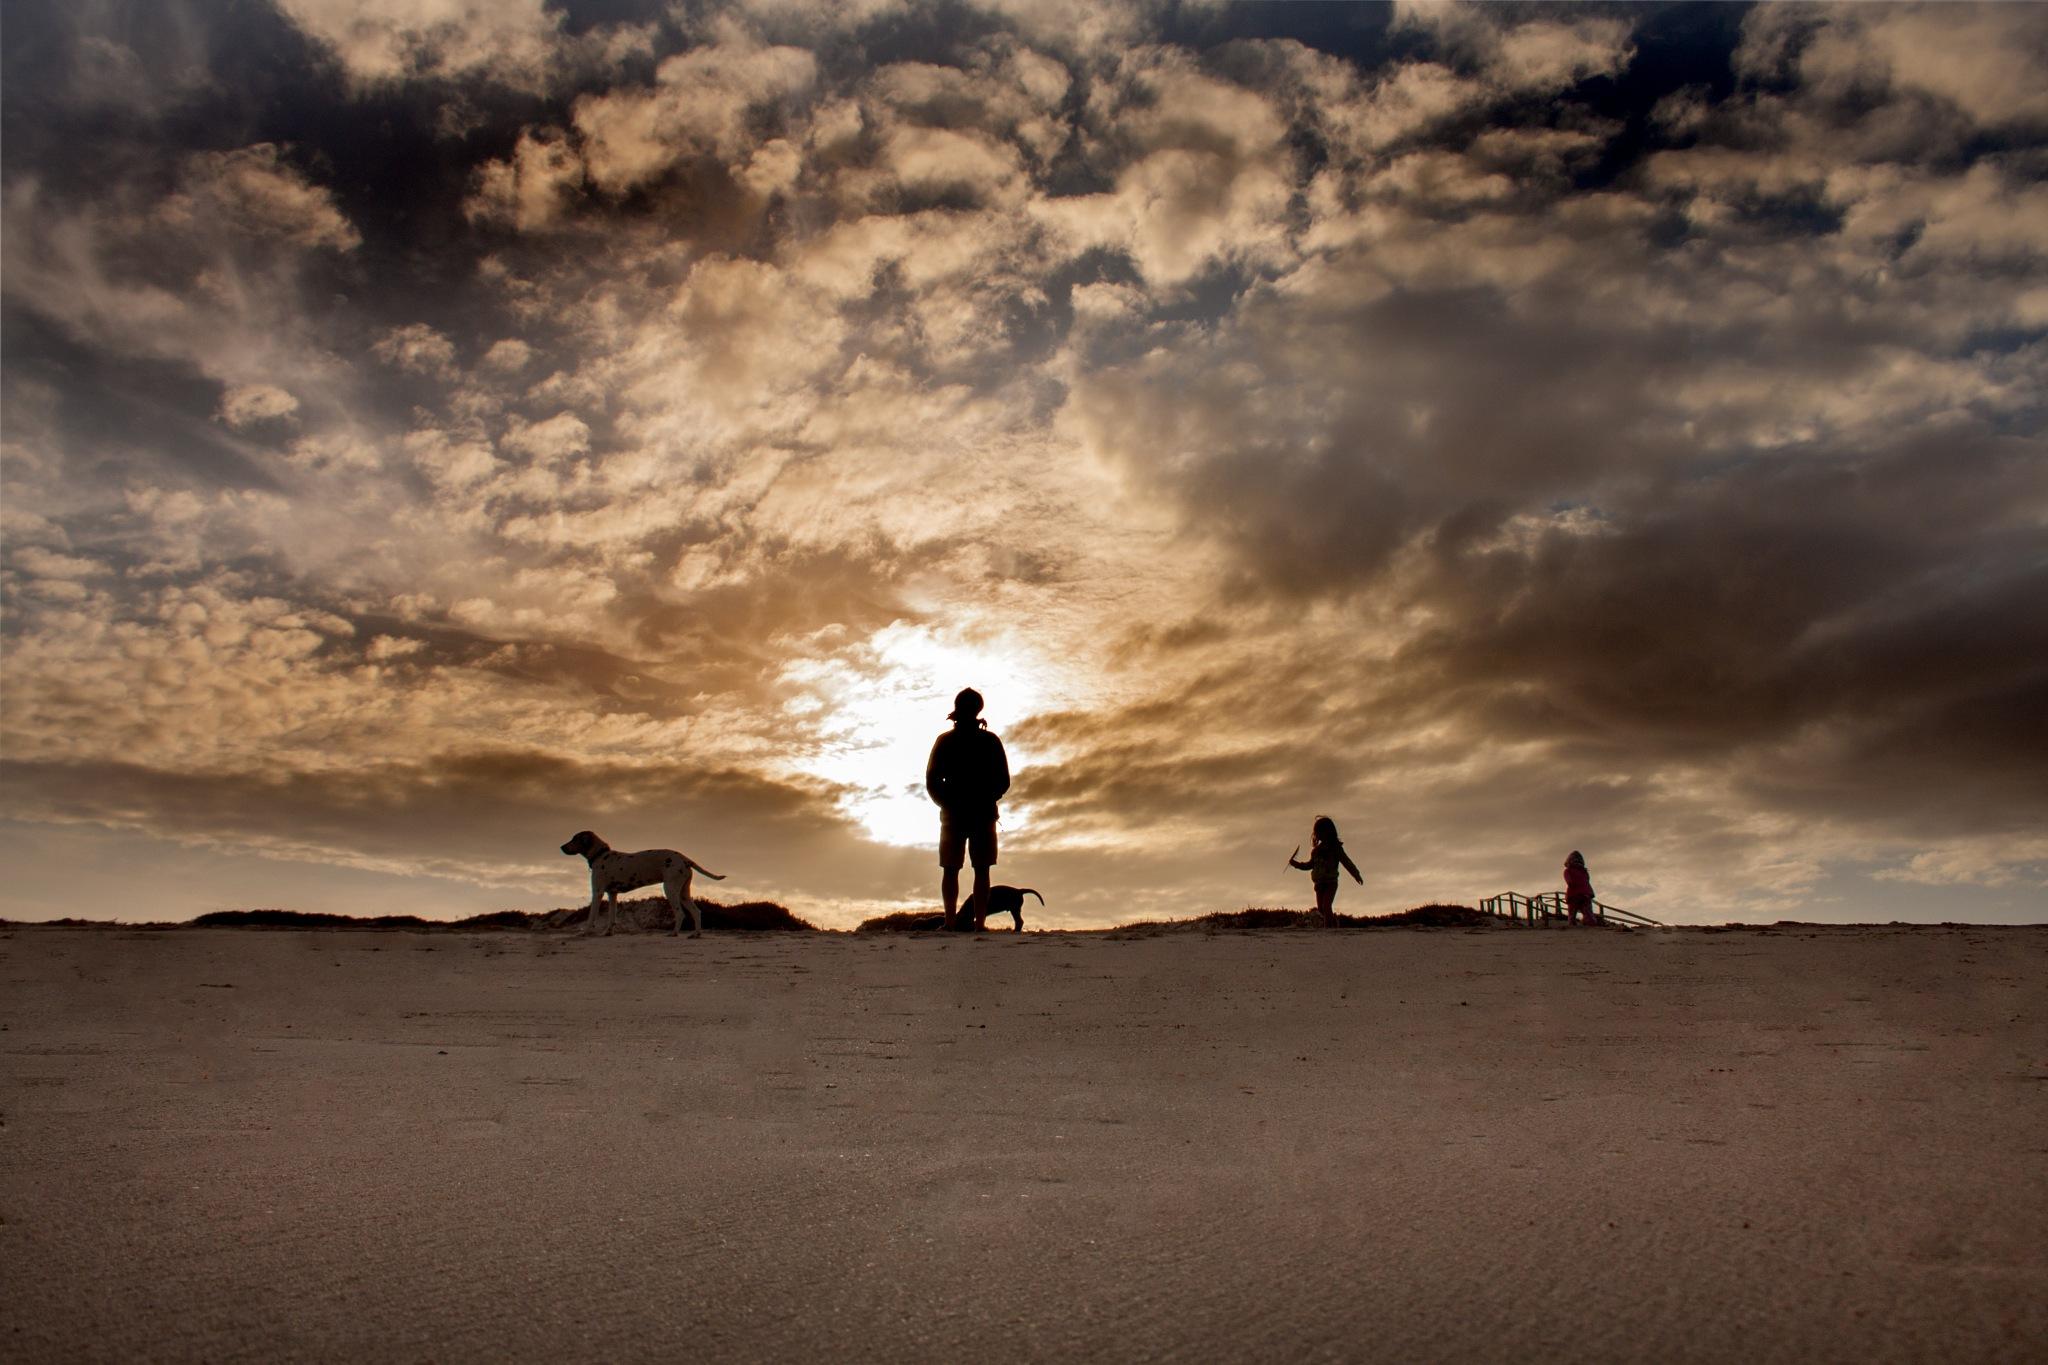 Silhouette by Nauta Piscatorque